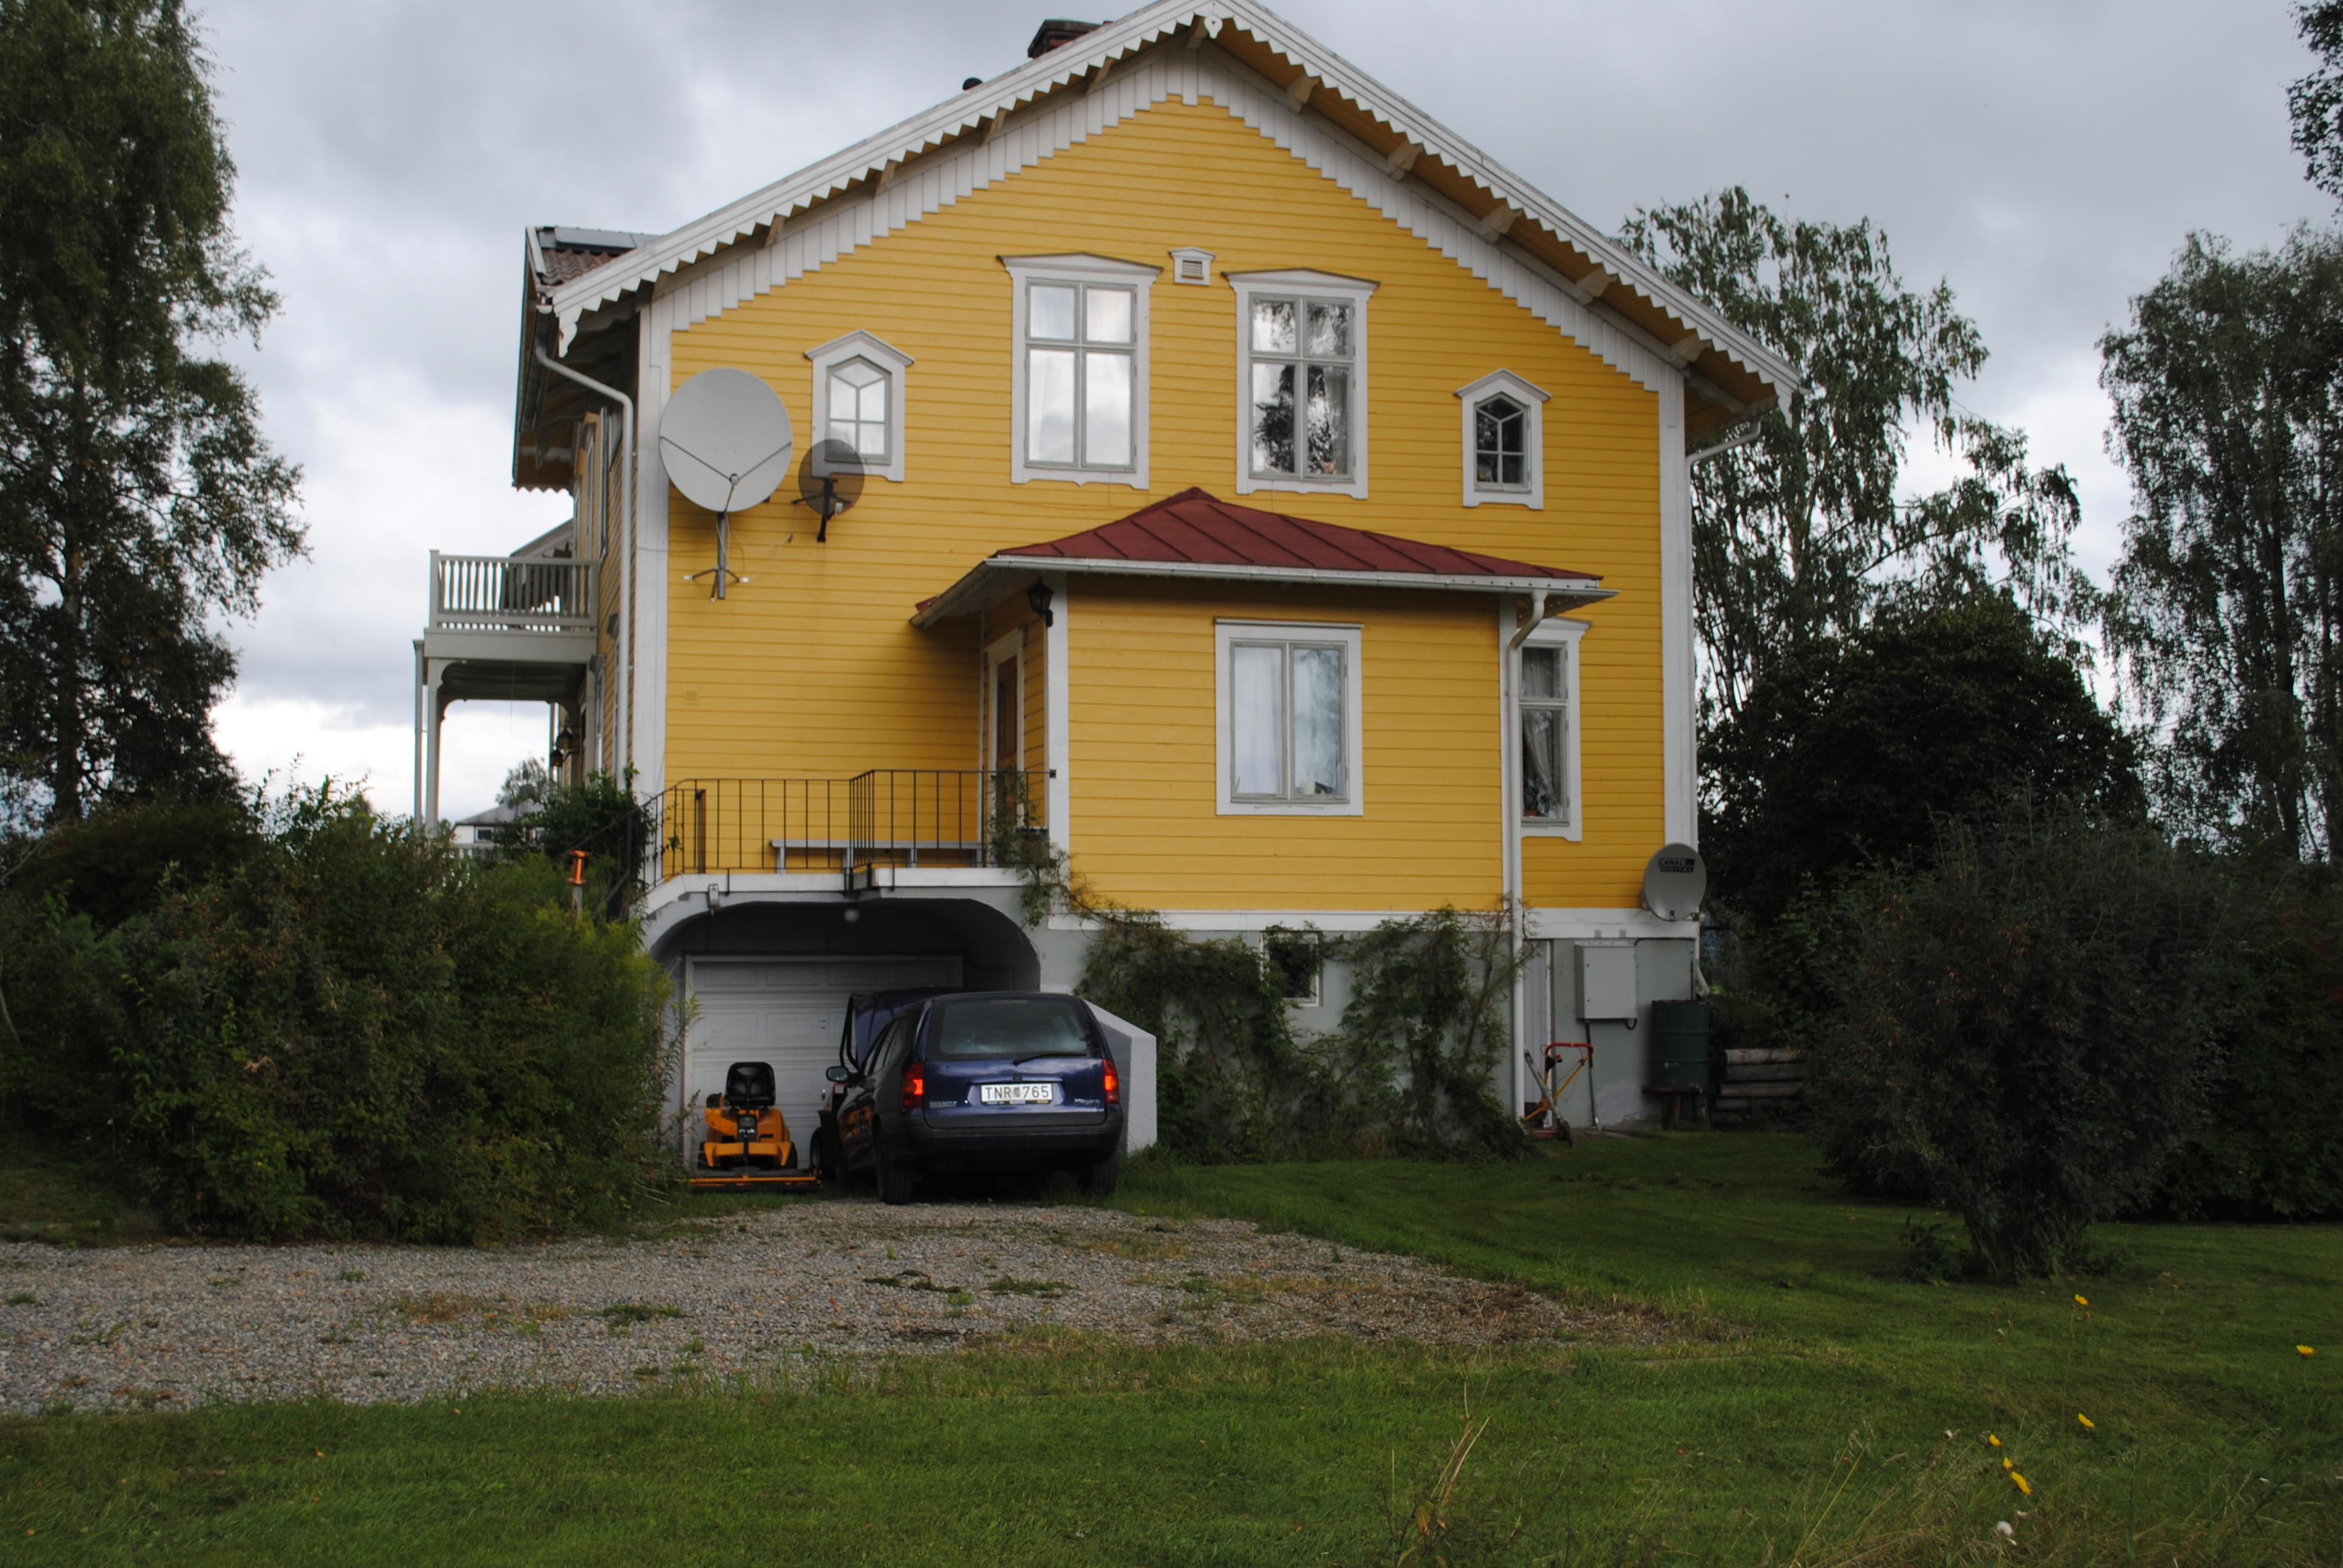 Vente villa nyland ngermanland su de kyrkv gen 23 for Acheter maison suede